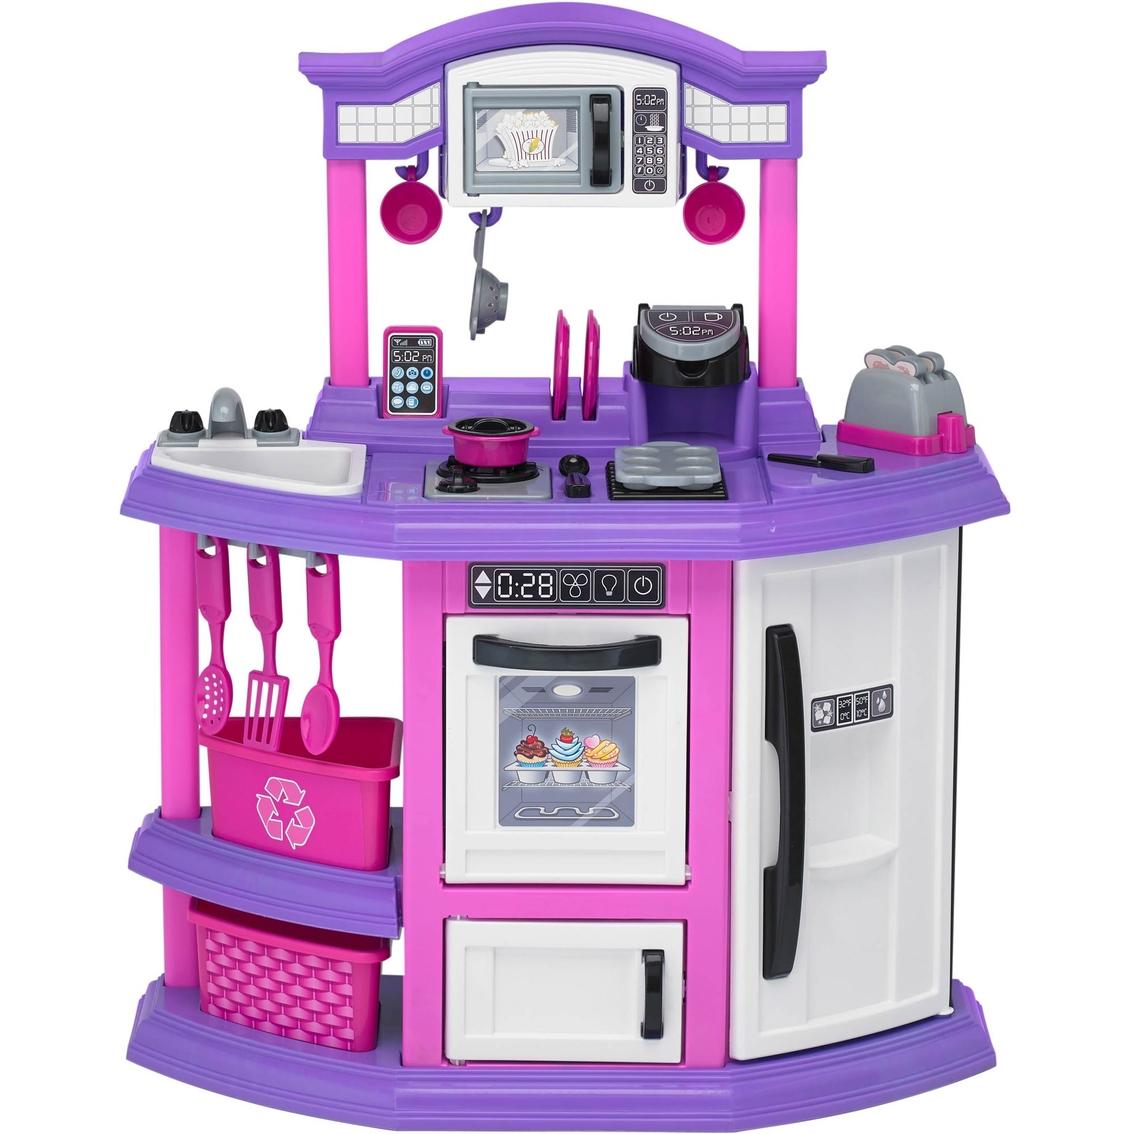 american plastic toys baker u0027s play kitchen american plastic toys baker u0027s play kitchen   kitchens grills      rh   shopmyexchange com